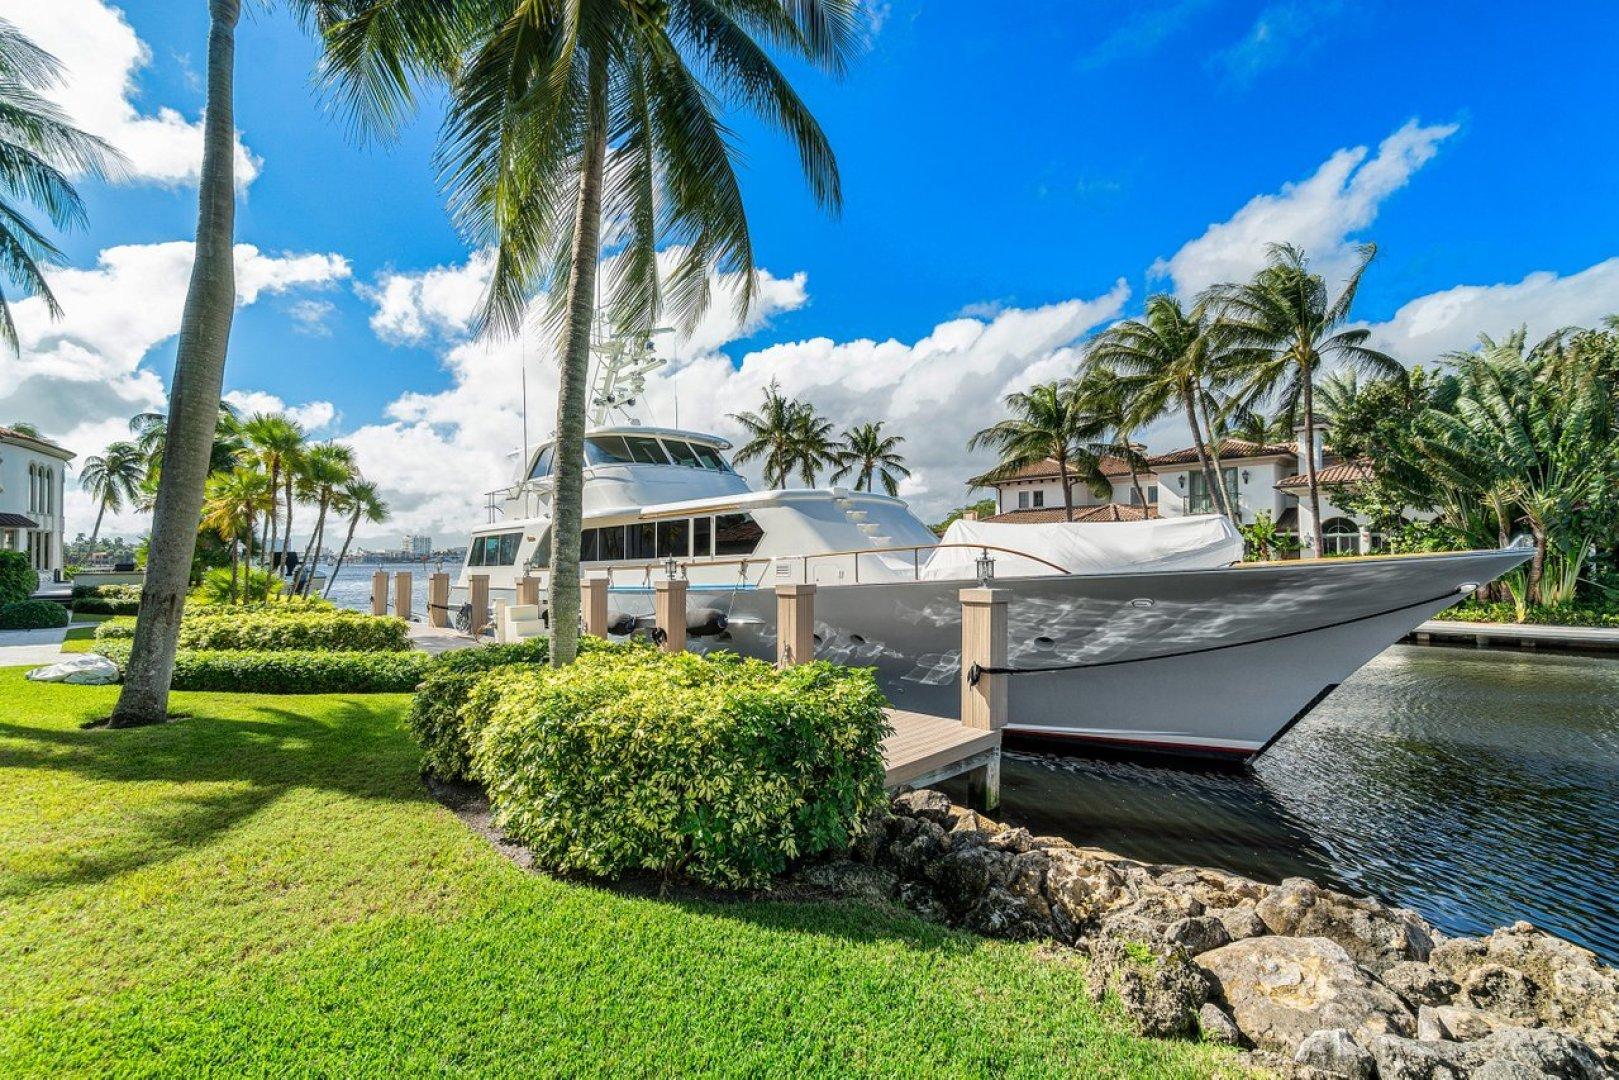 Feadship-Yacht Fisherman 1977-Impetuous Fort Lauderdale-Florida-United States-1575473 | Thumbnail